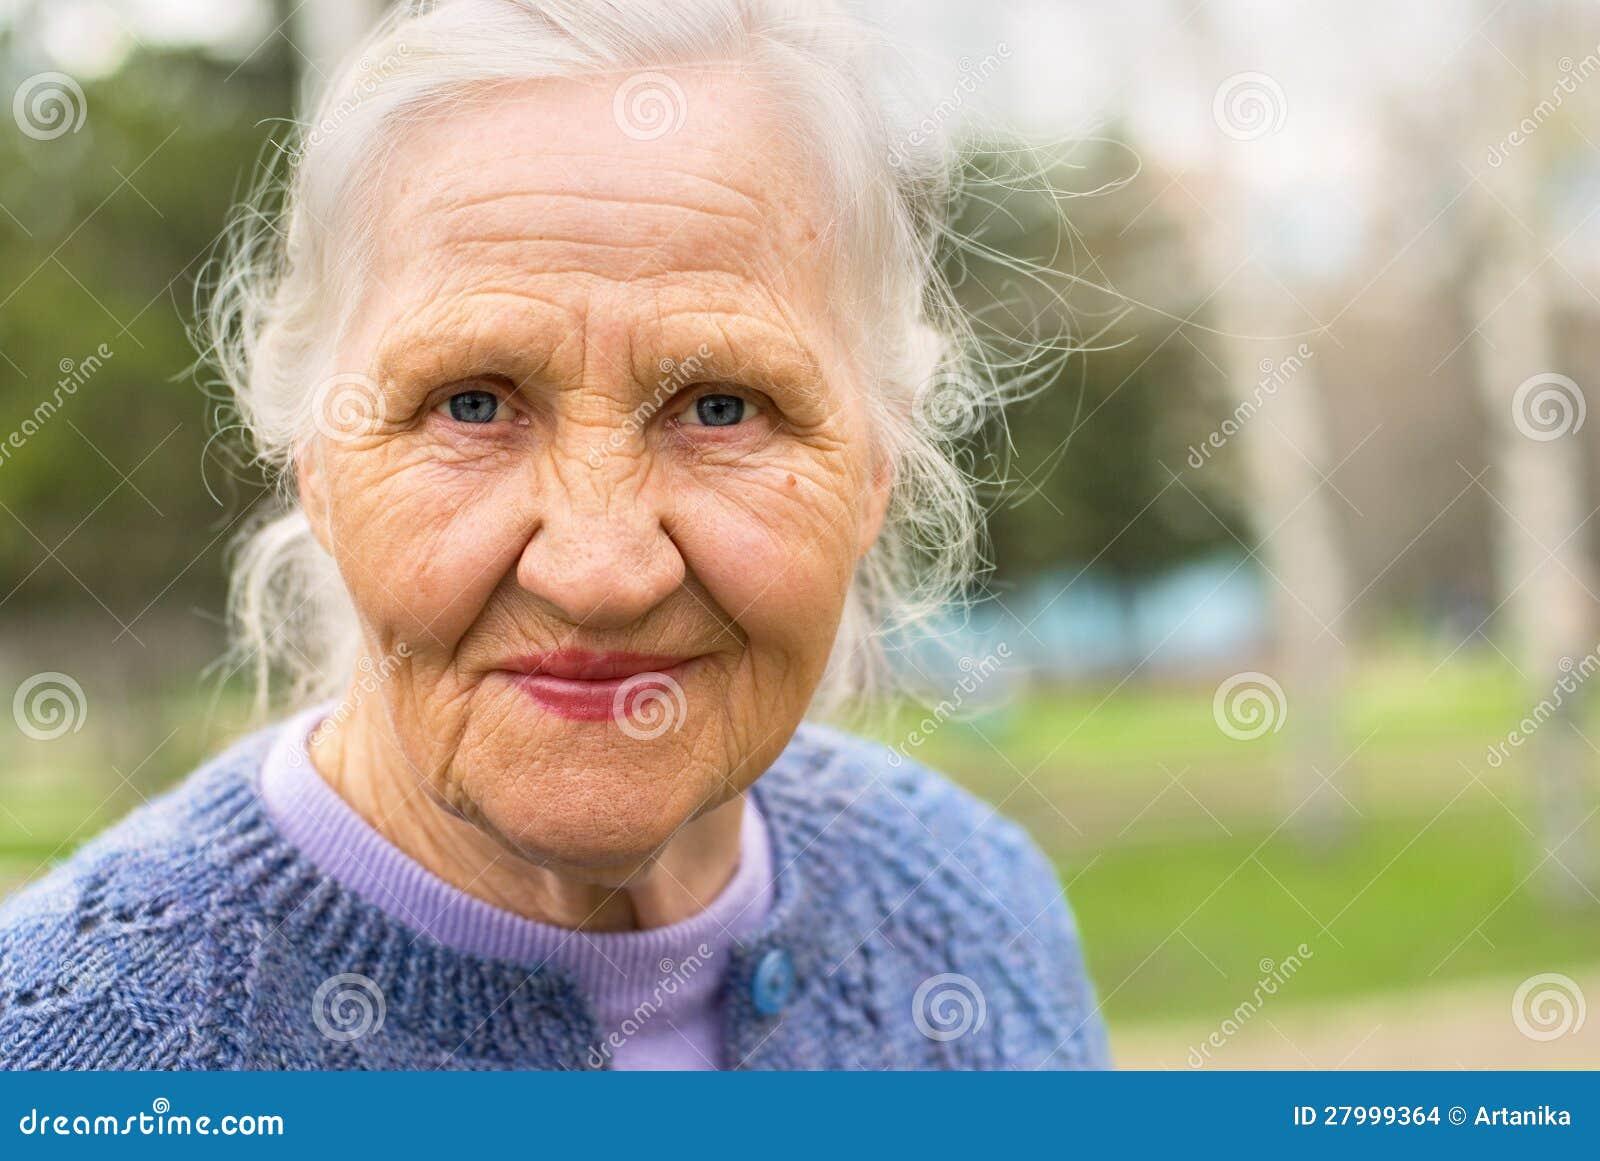 Lächelnde ältere Frau des Porträts